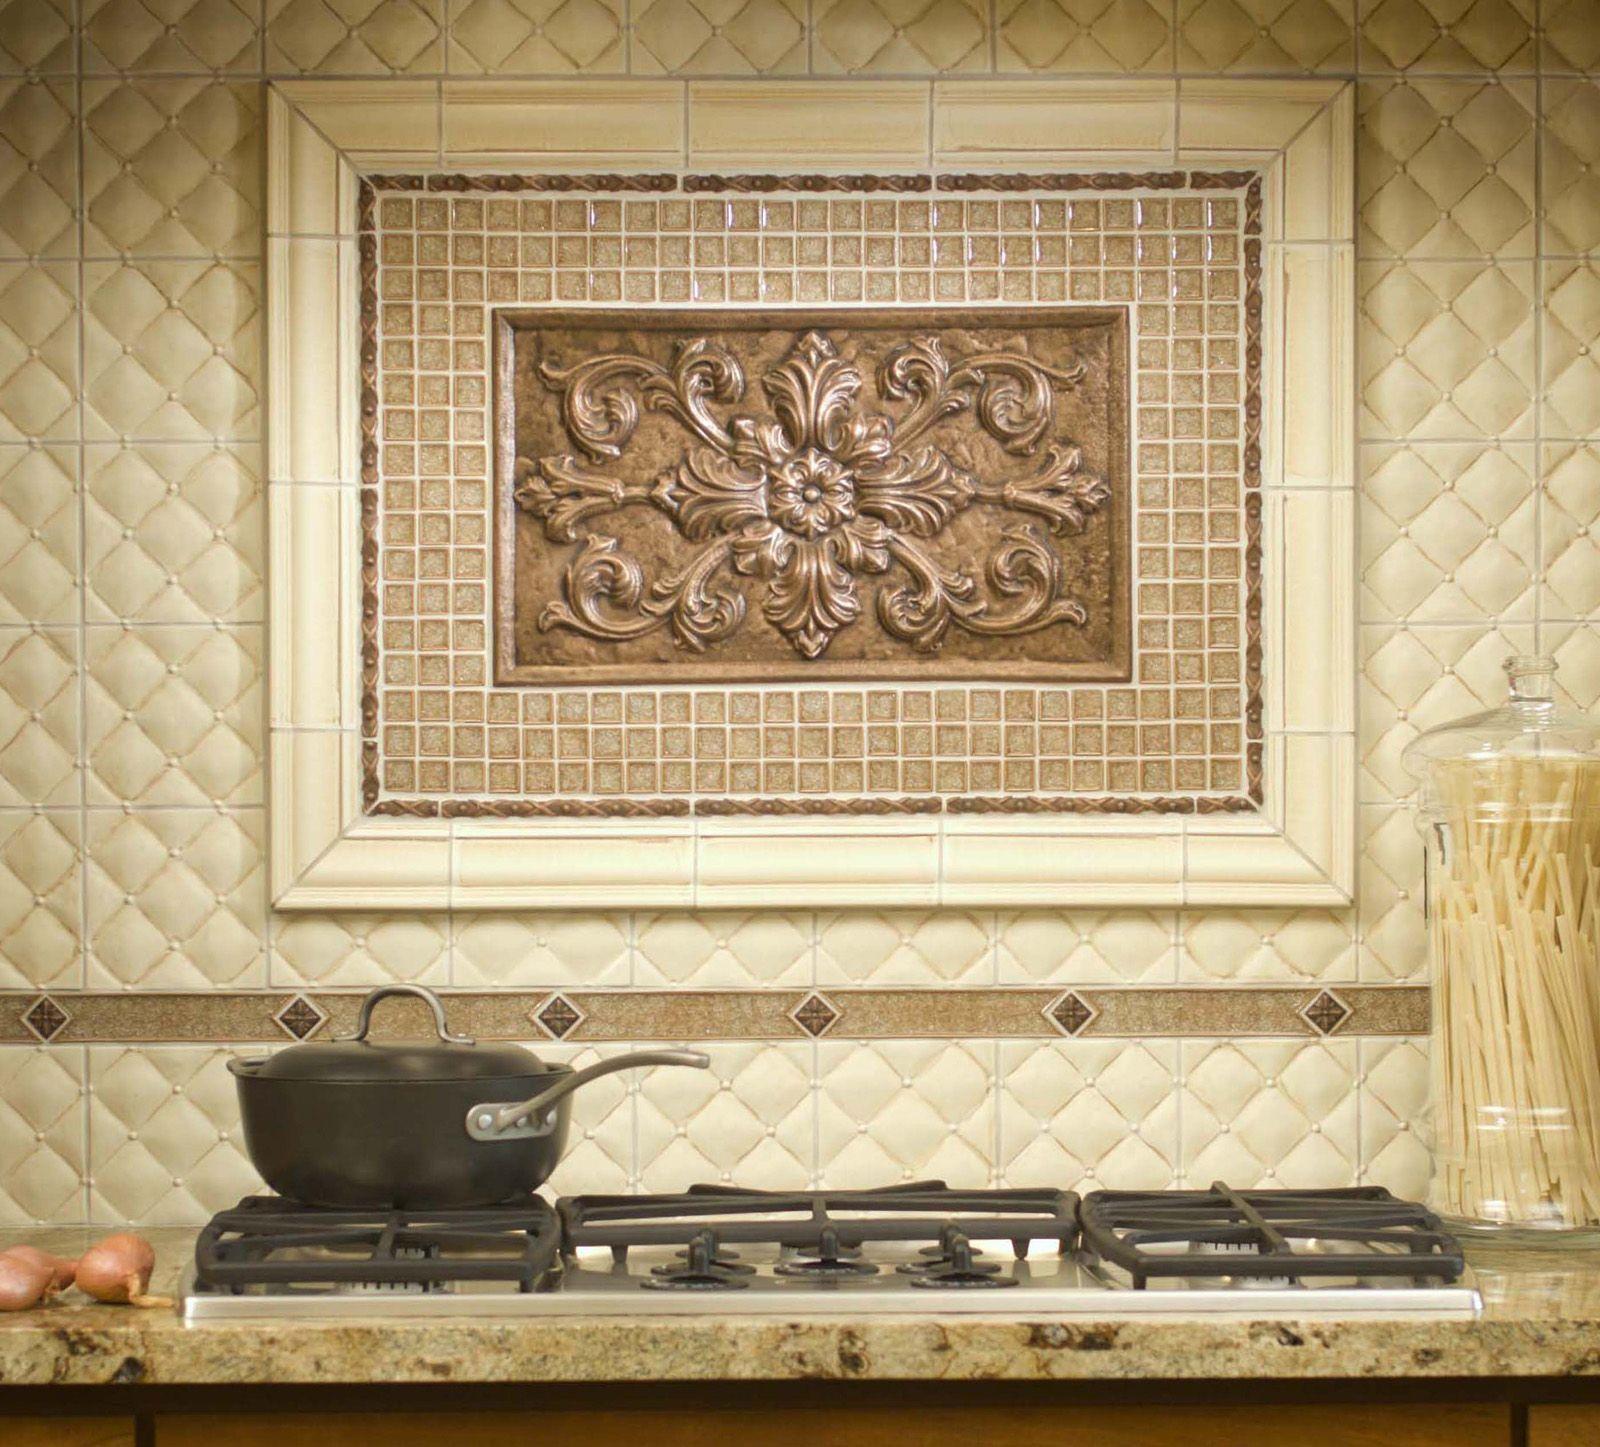 Mosaic tile backsplash designs